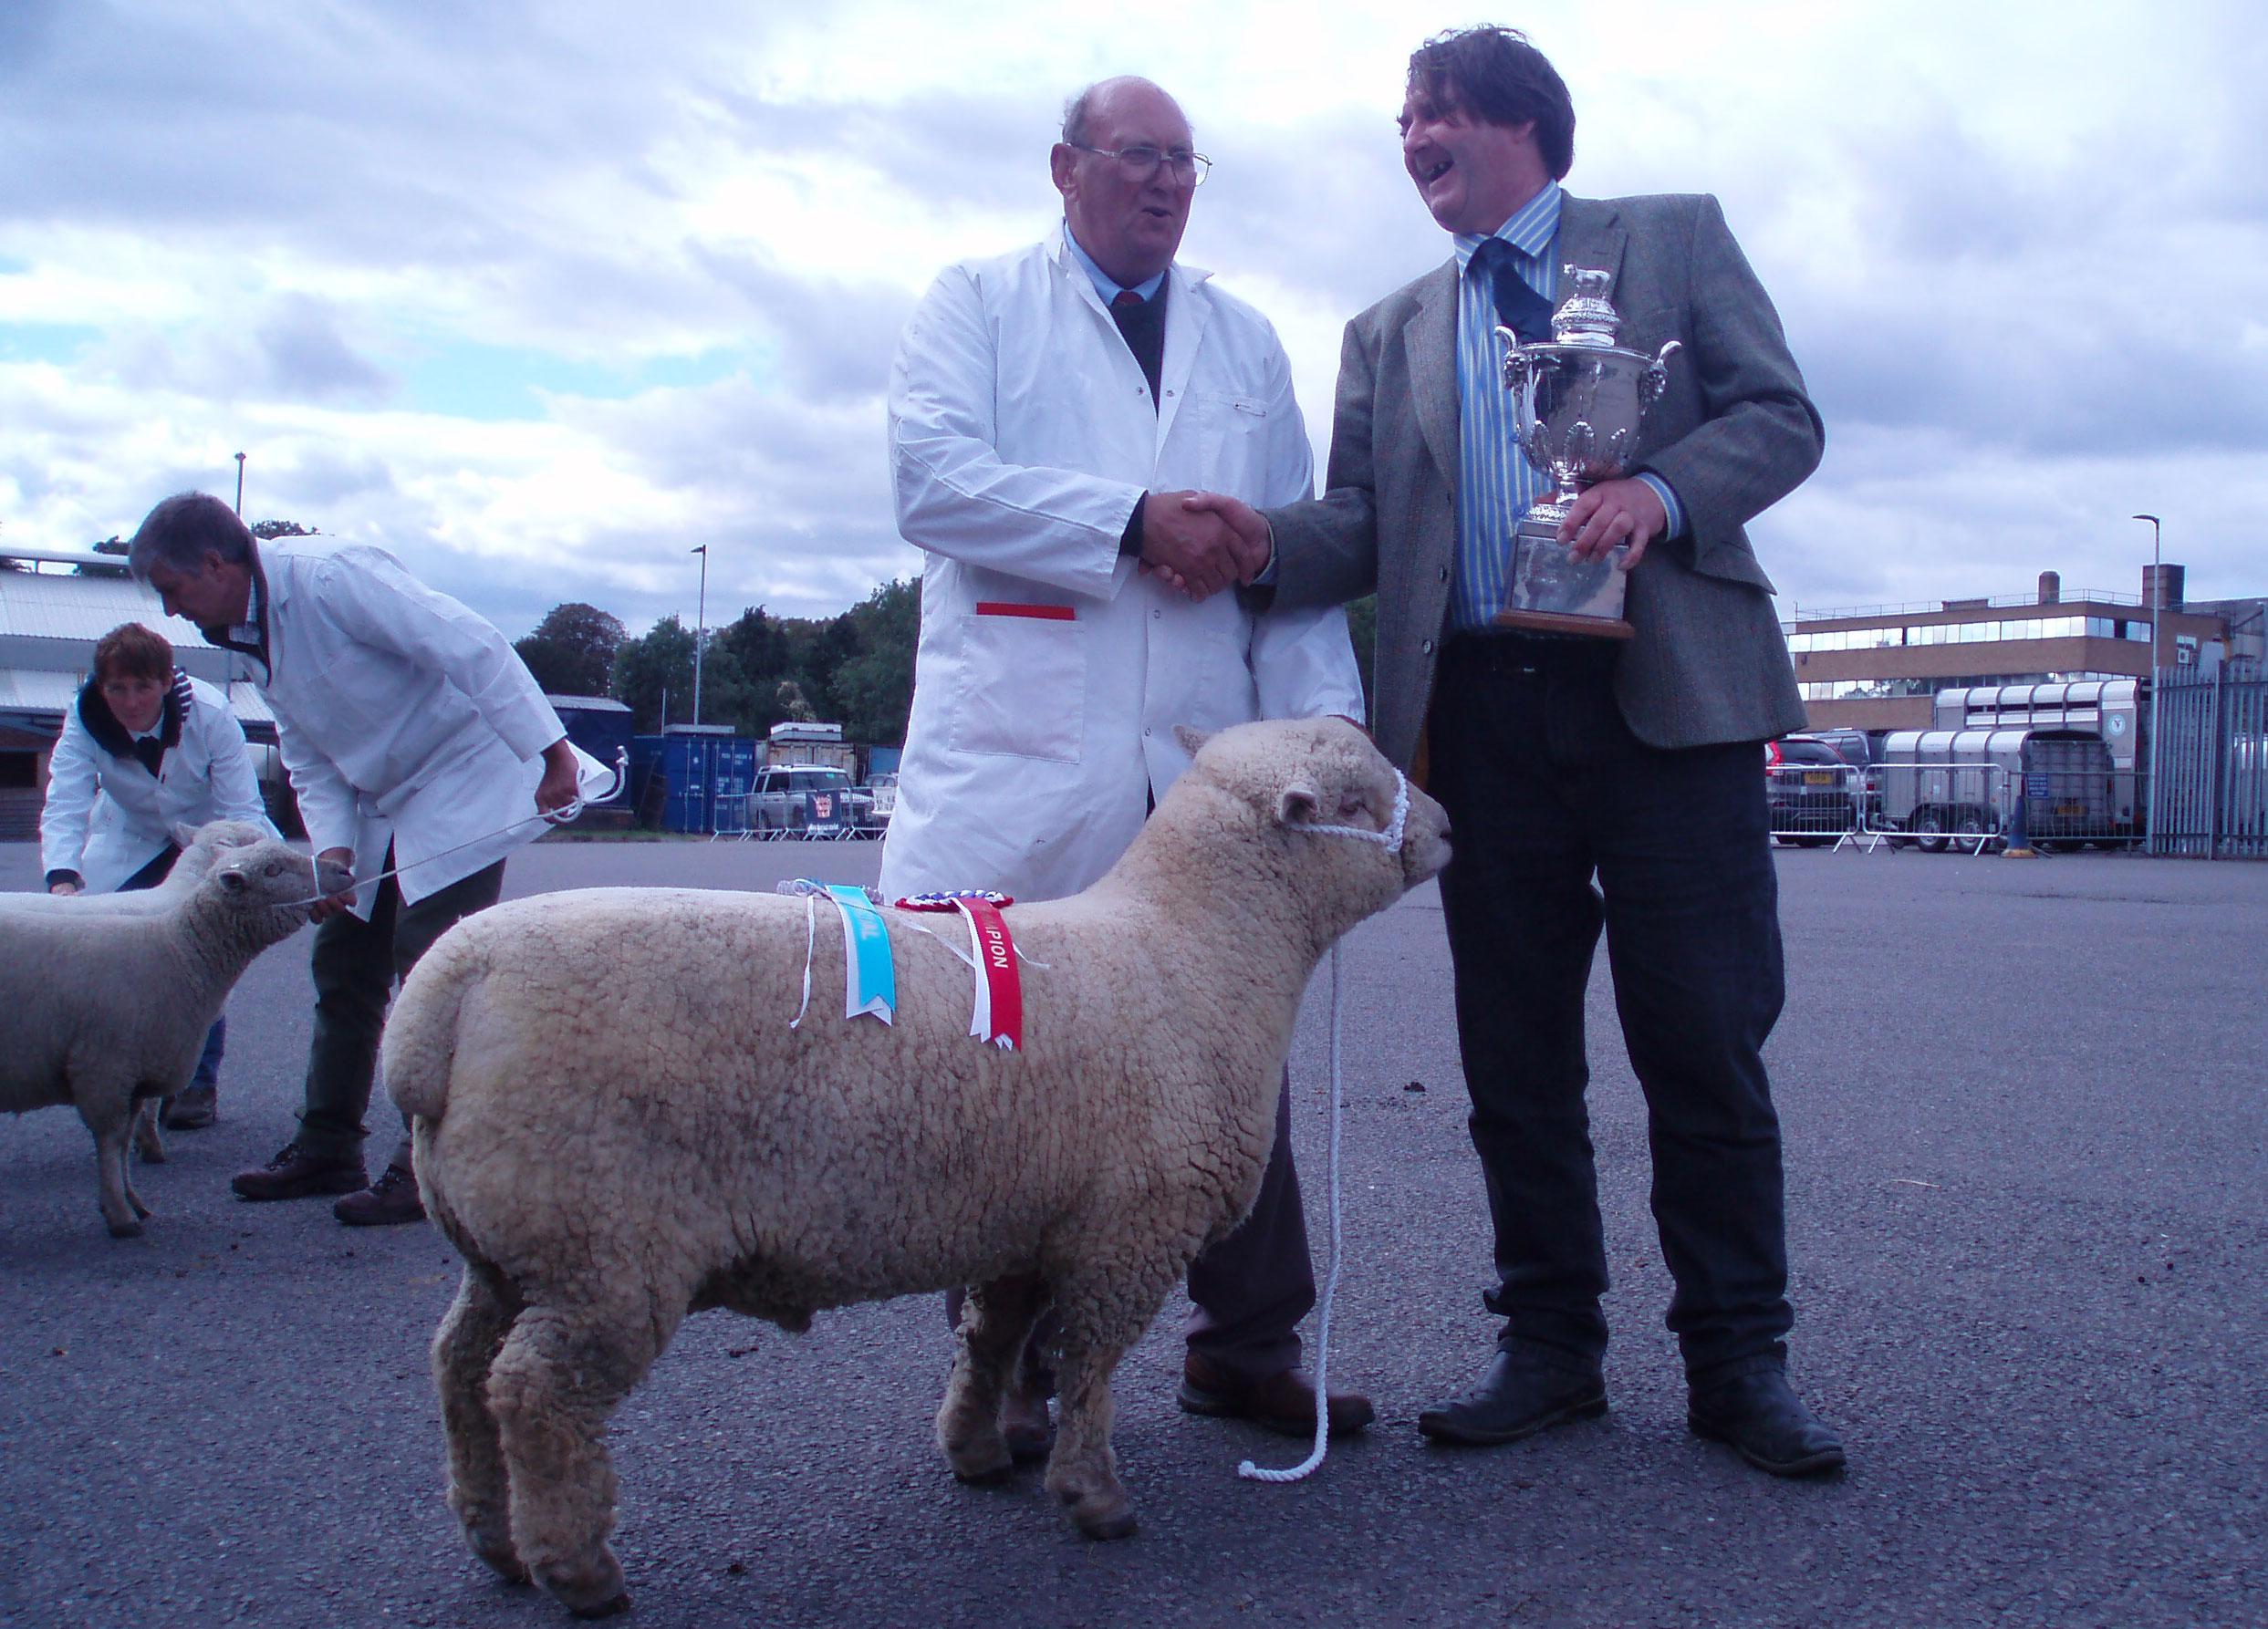 Melton Mowbray Show Champion ; de Pibrac 'Teddy' 17/00231, bred by Mr Nigel Barrington-Fuller, shown by Mr Jim Cresswell.